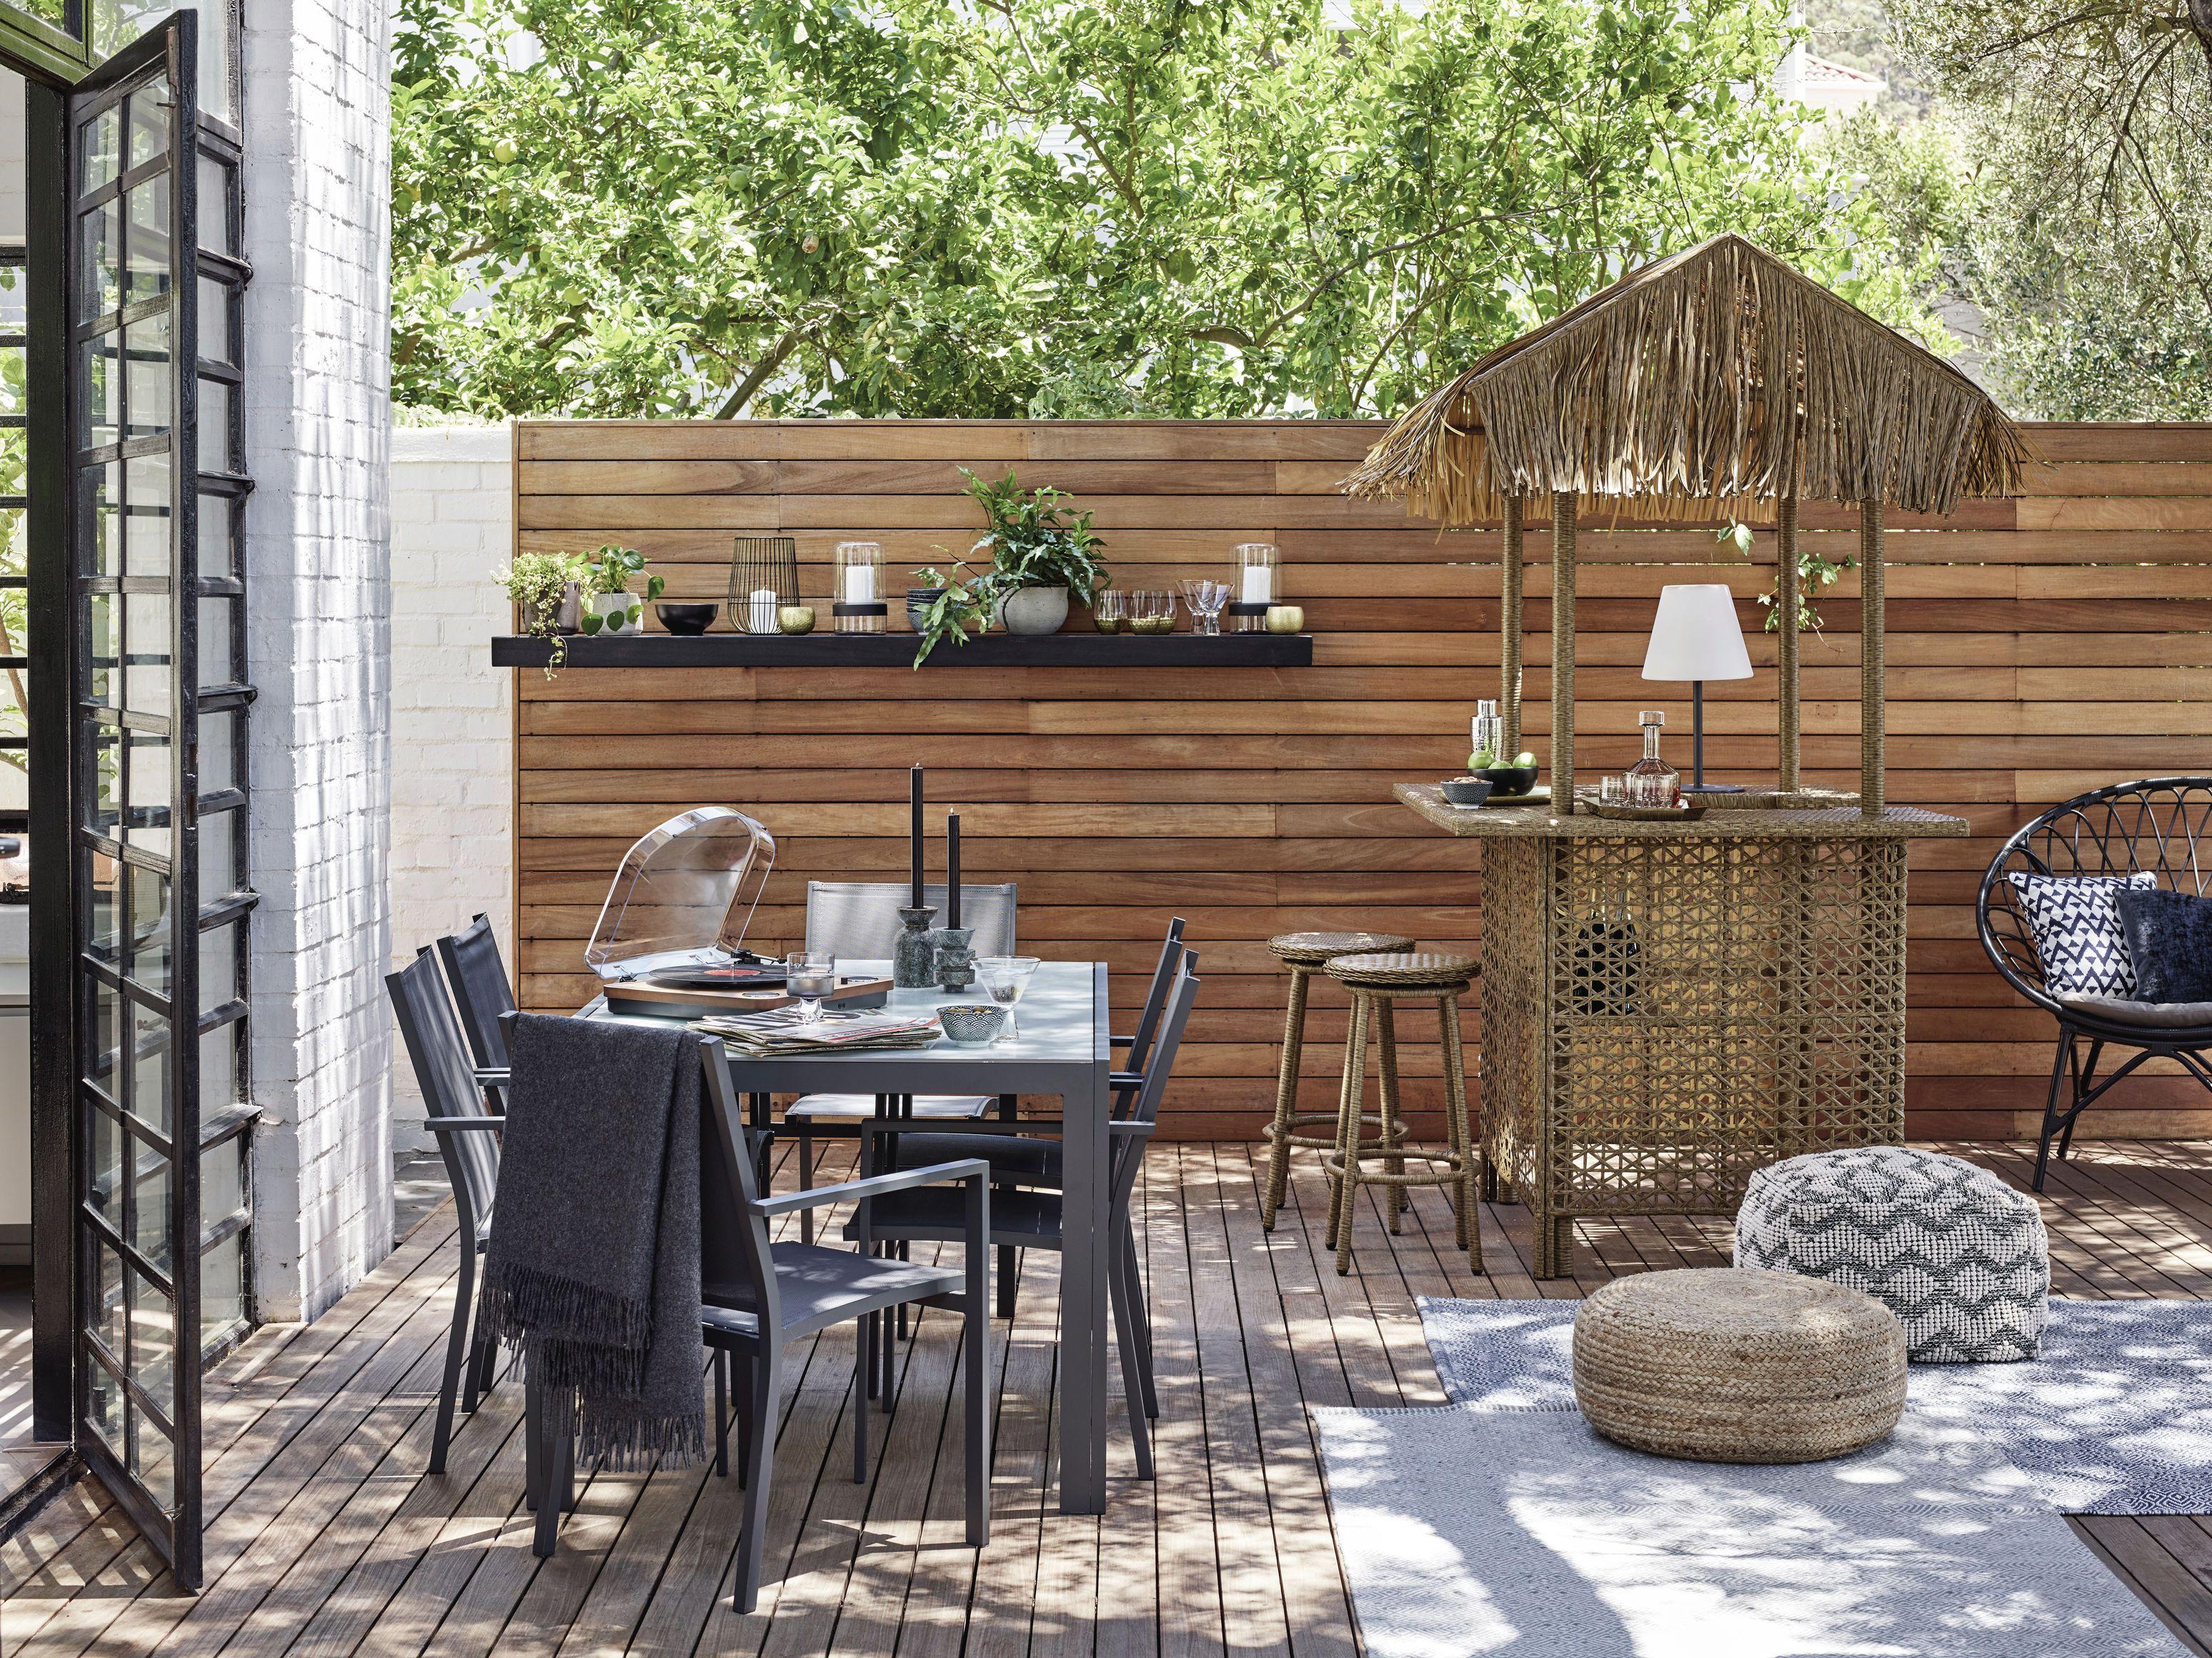 31e0da219c6 12 Stylish Garden Furniture Sets - Best Outdoor Furniture Sets